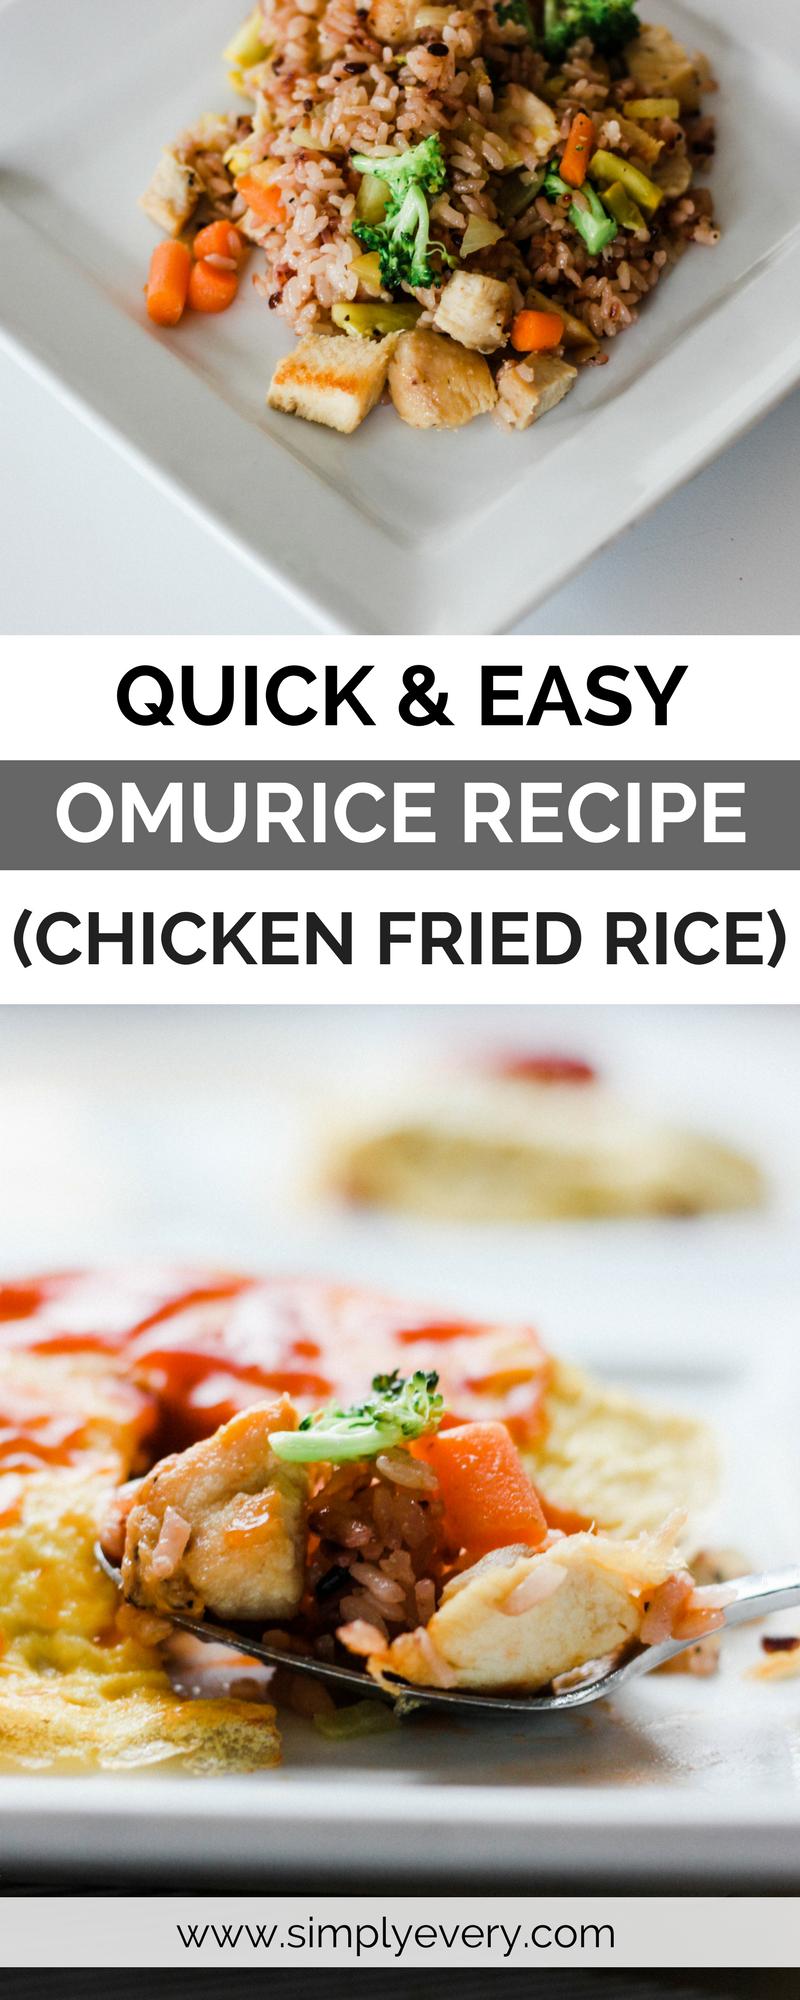 Quick & Easy Omurice Recipe